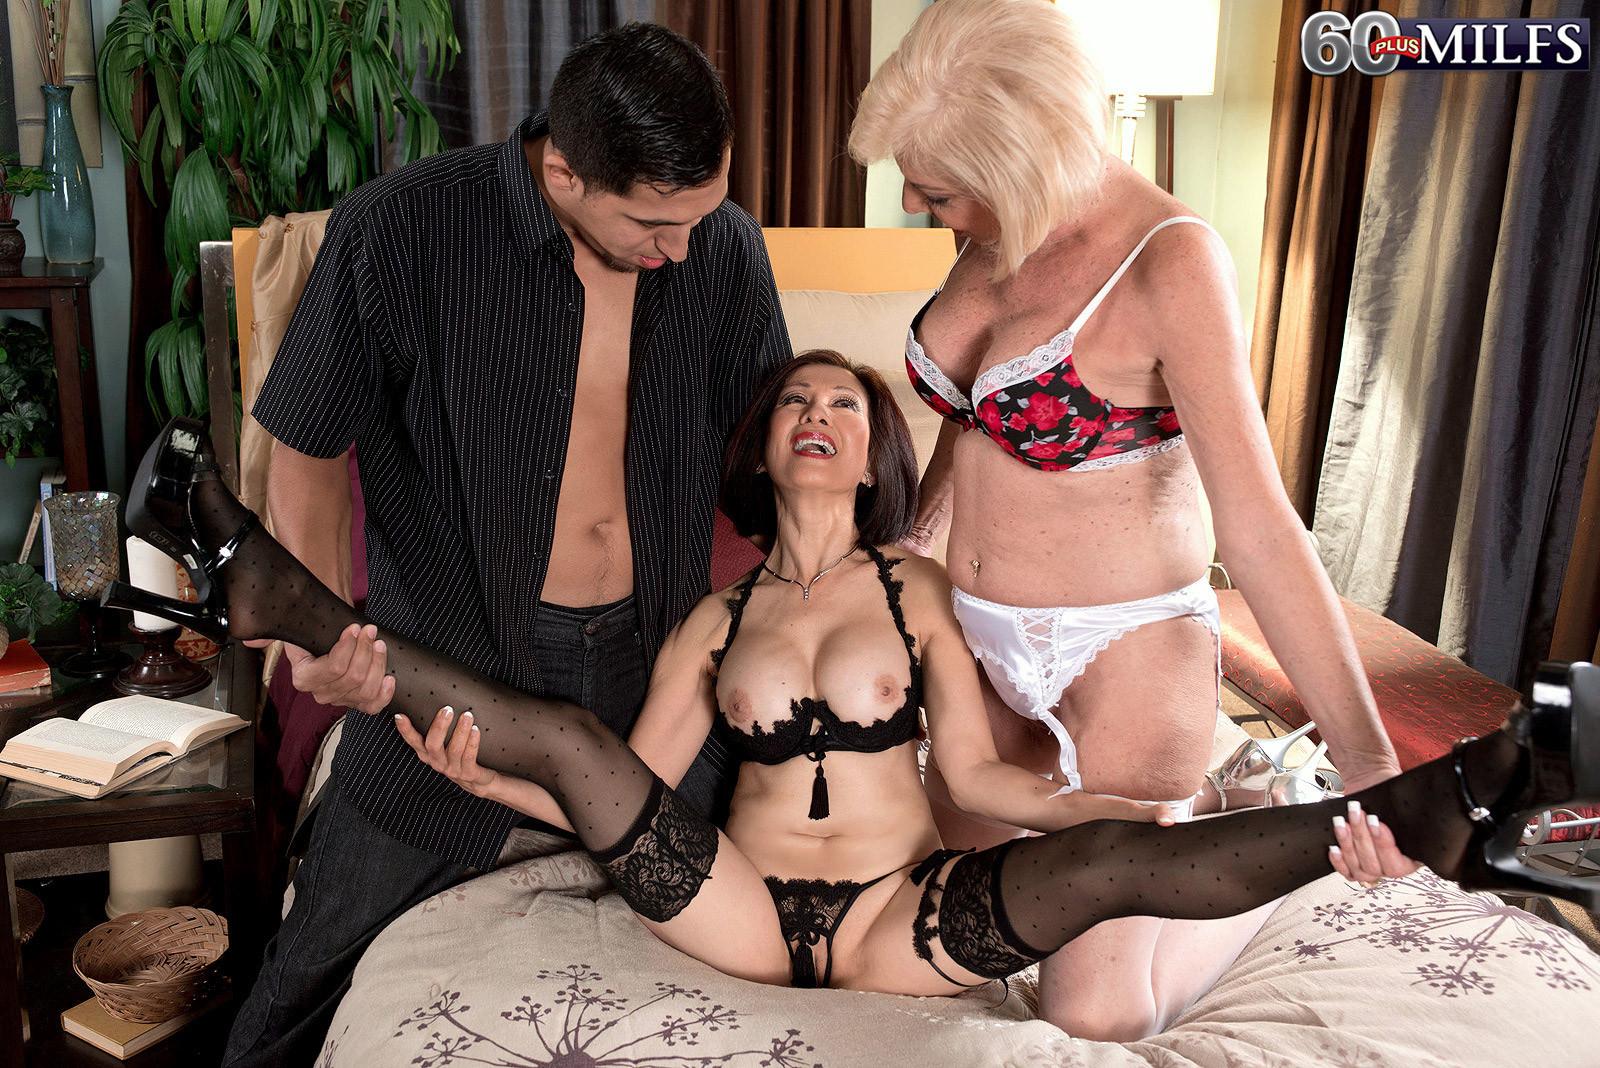 Две зрелые дамочки соблазняют одного мужчину своими лесбийскими ласками и поцелуями